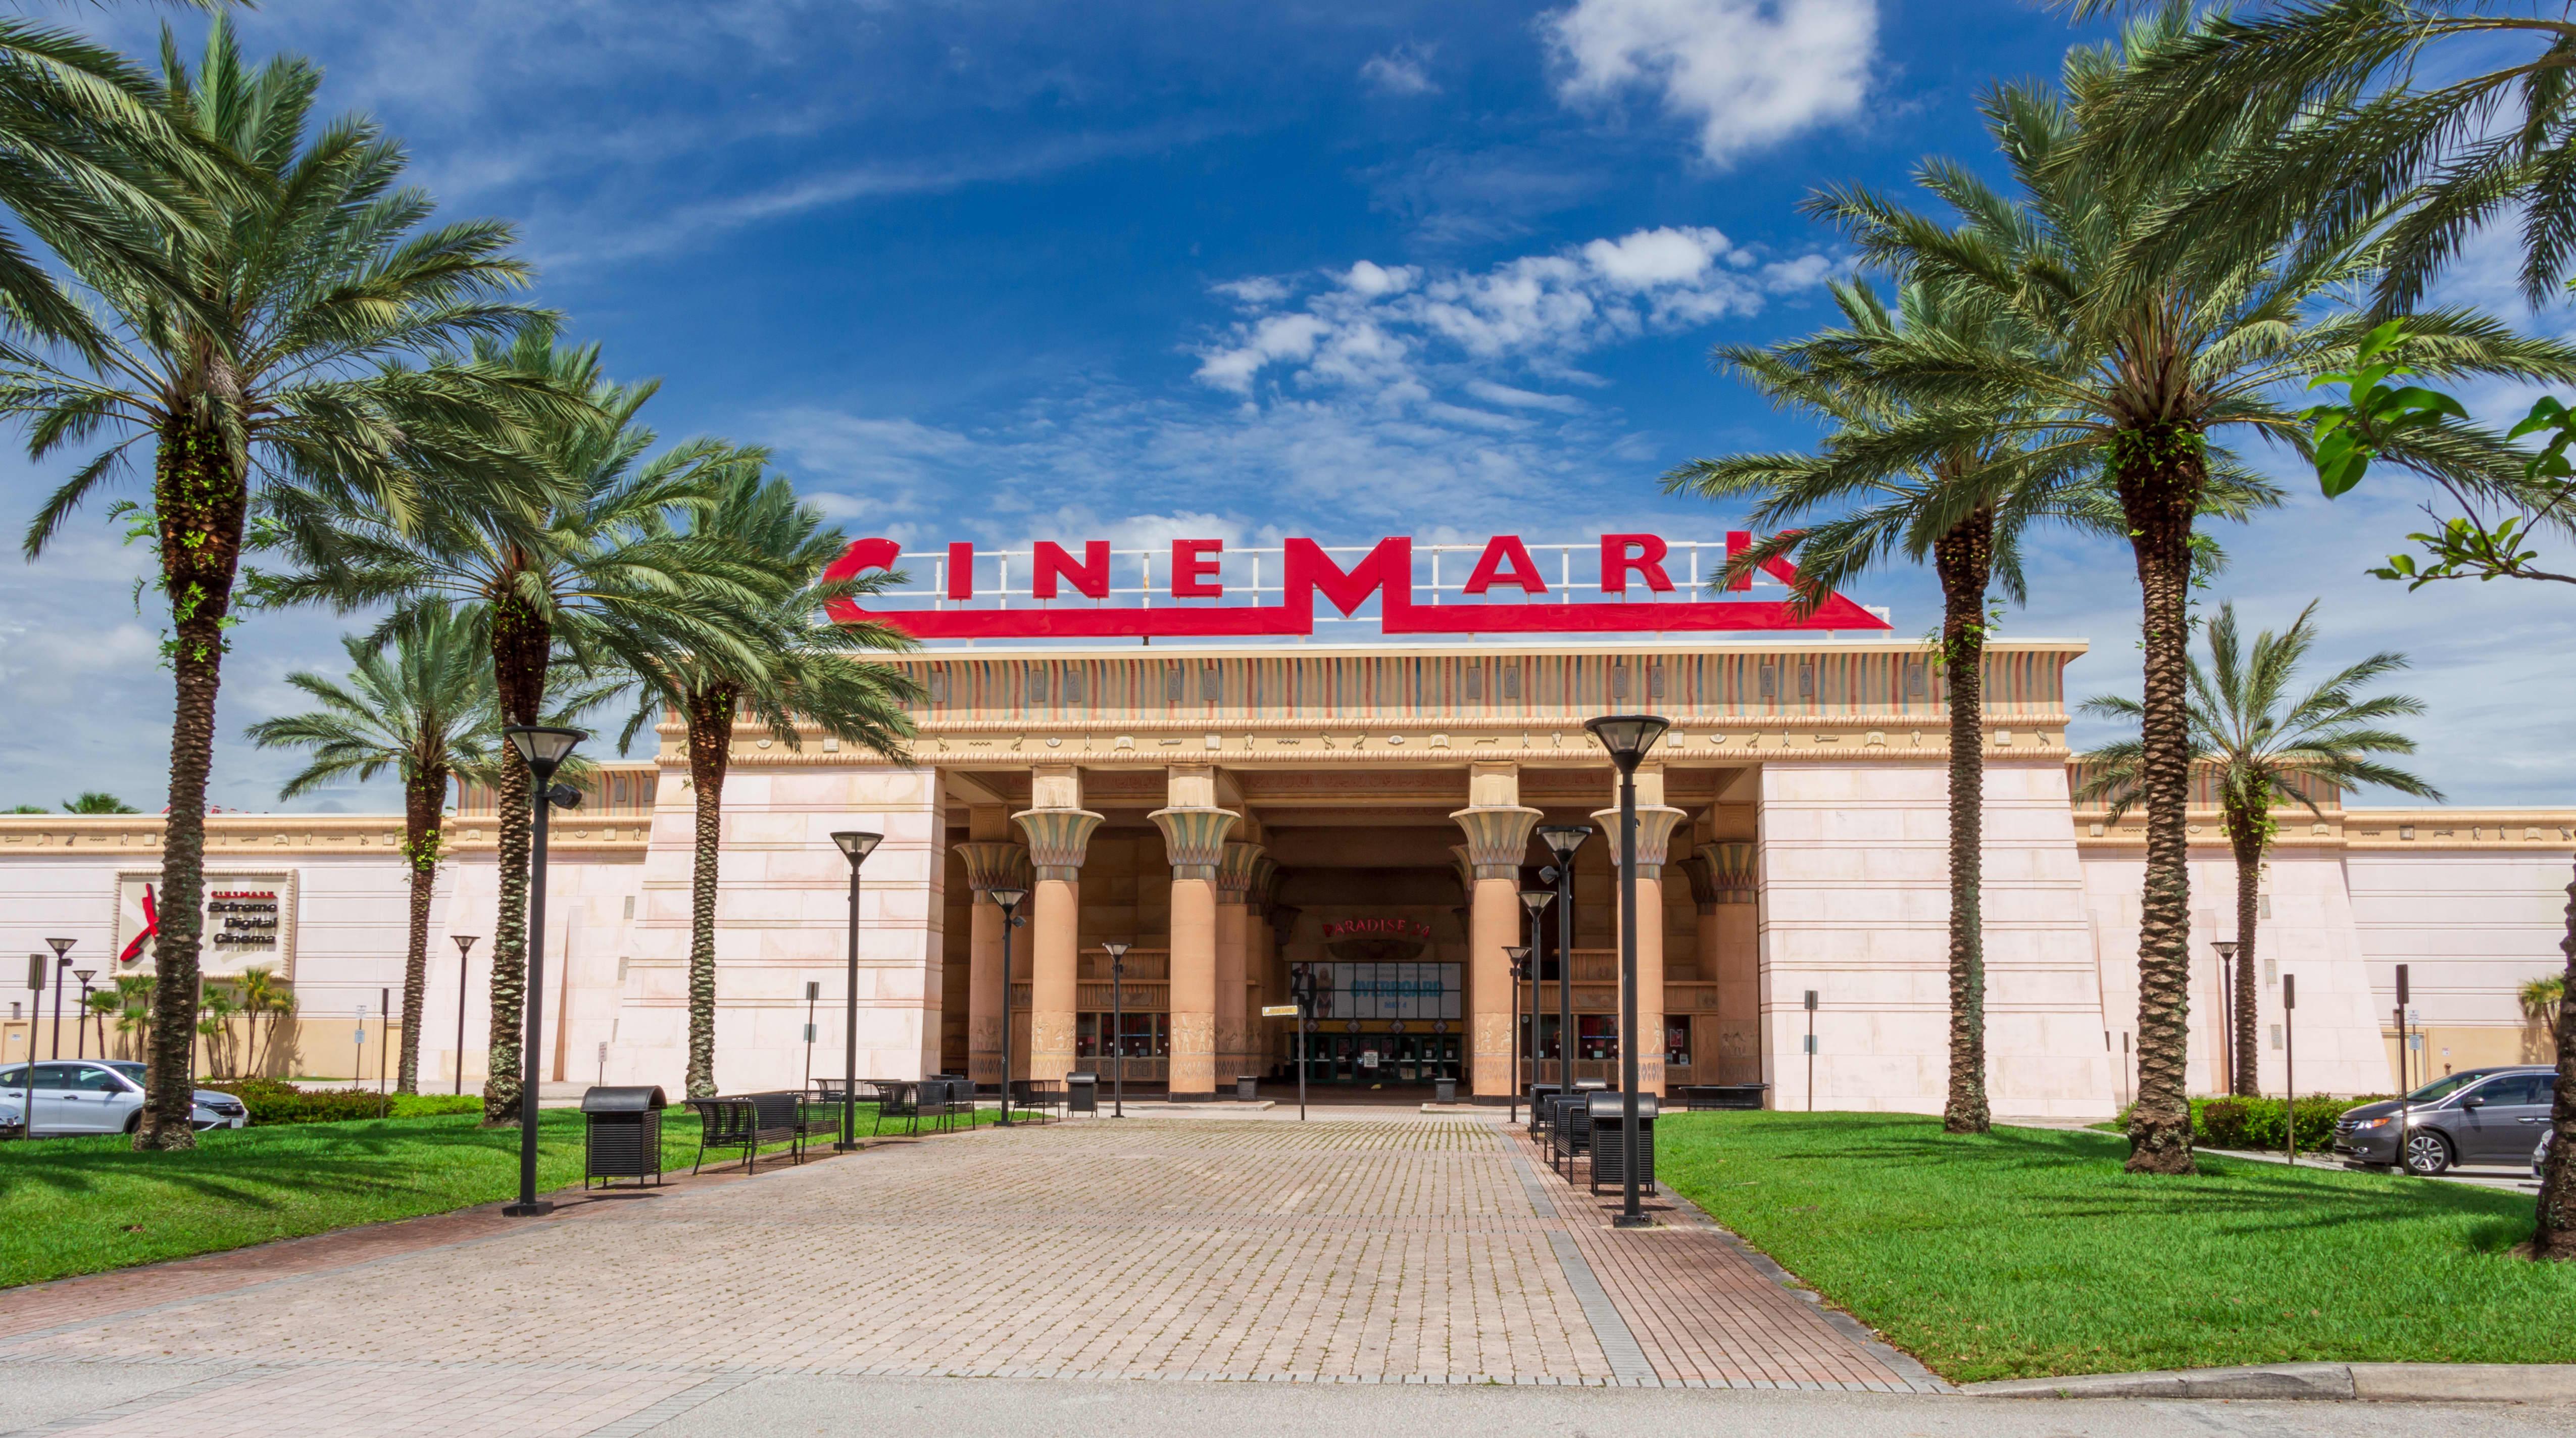 Cinemark offers a look at movie going post-coronavirus